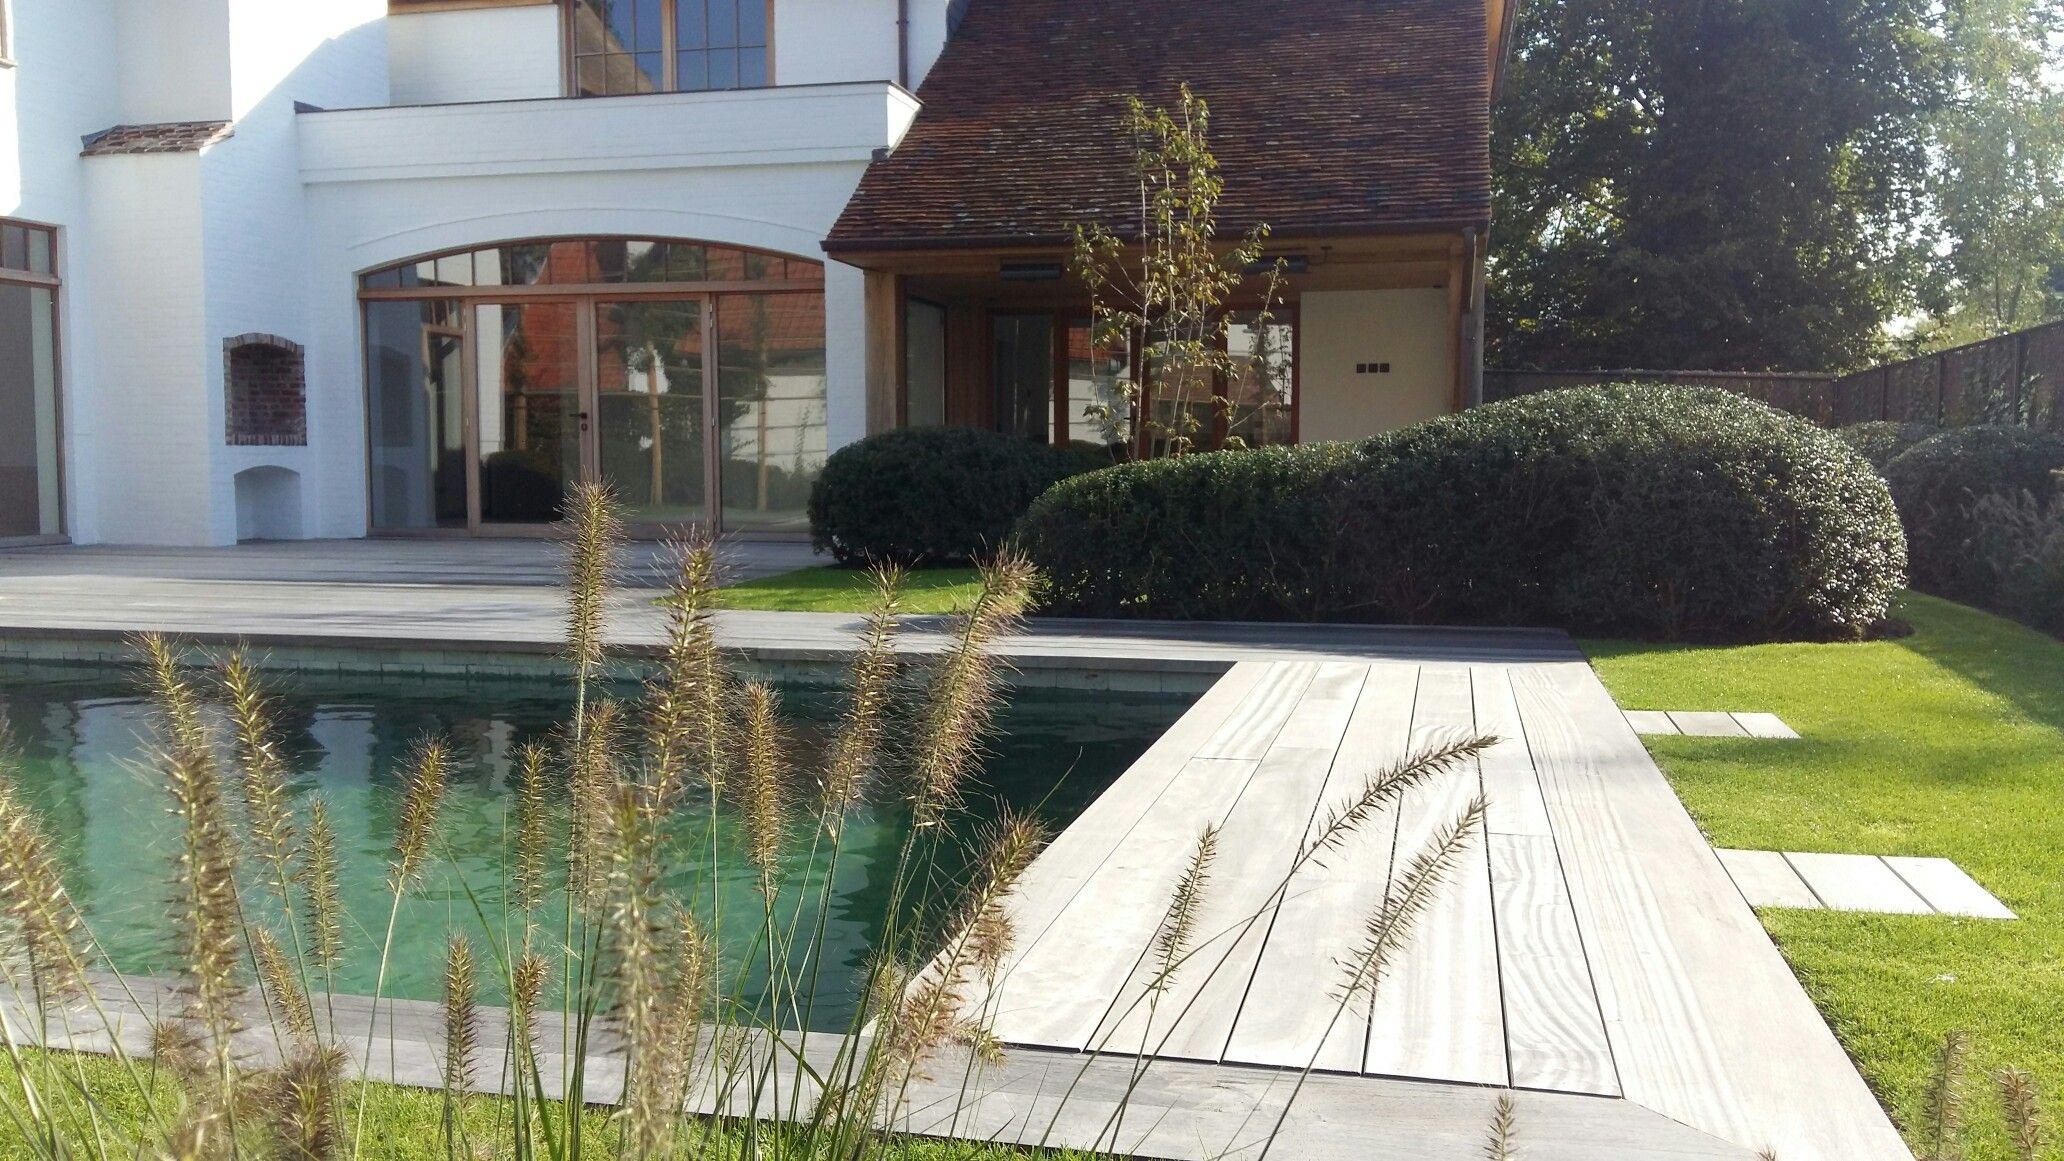 Ontwerp stephen baelde garden & pool ideas pinterest garden pool